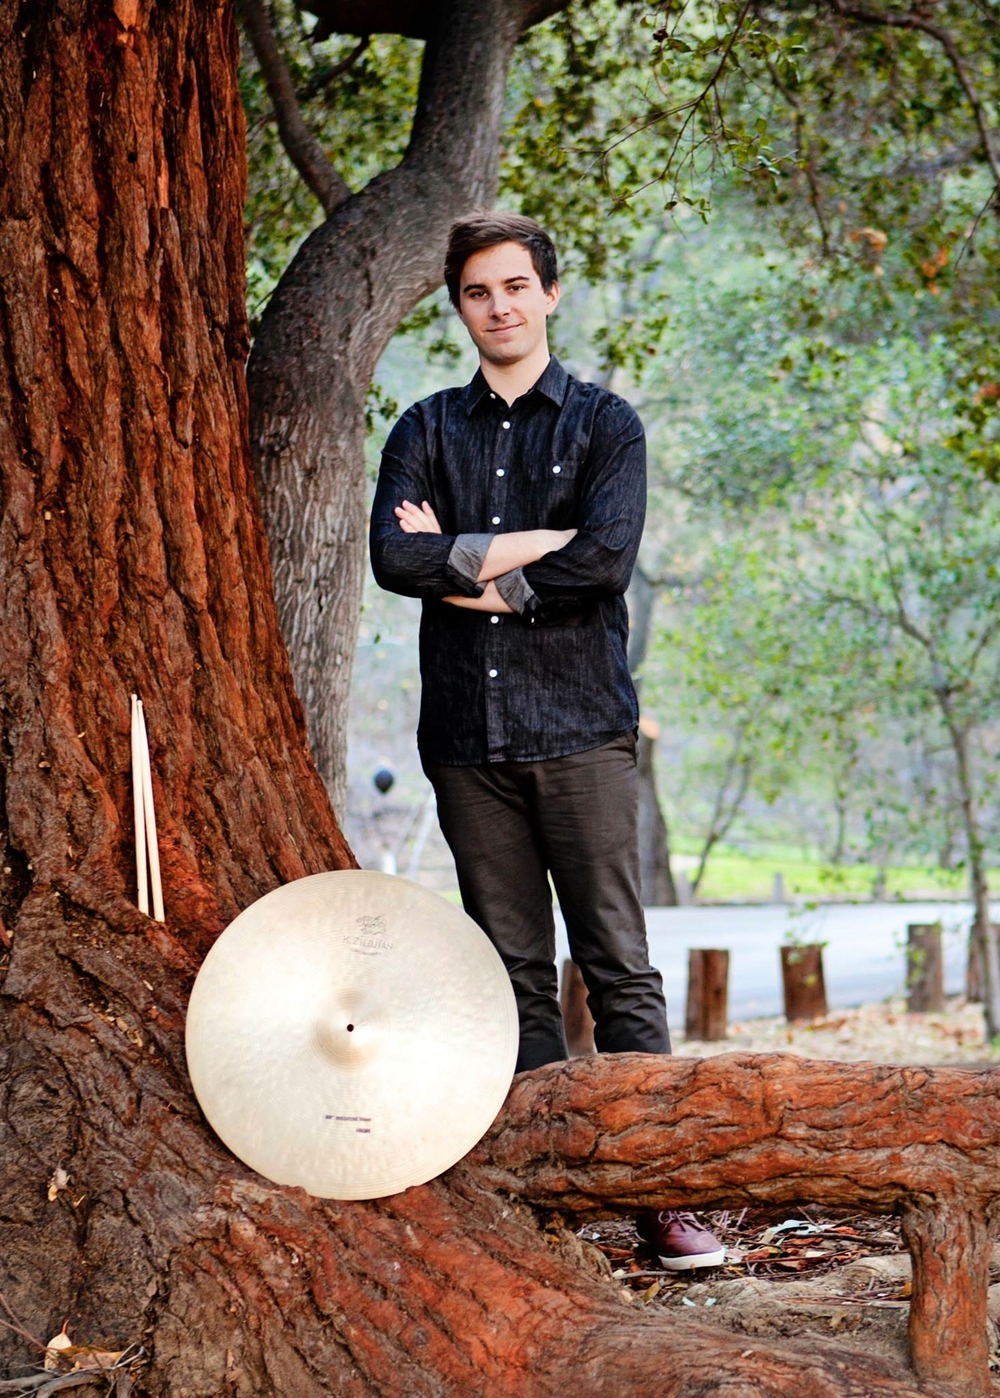 Connor Kent Drum Set - Snare Drum - Hand Percussion